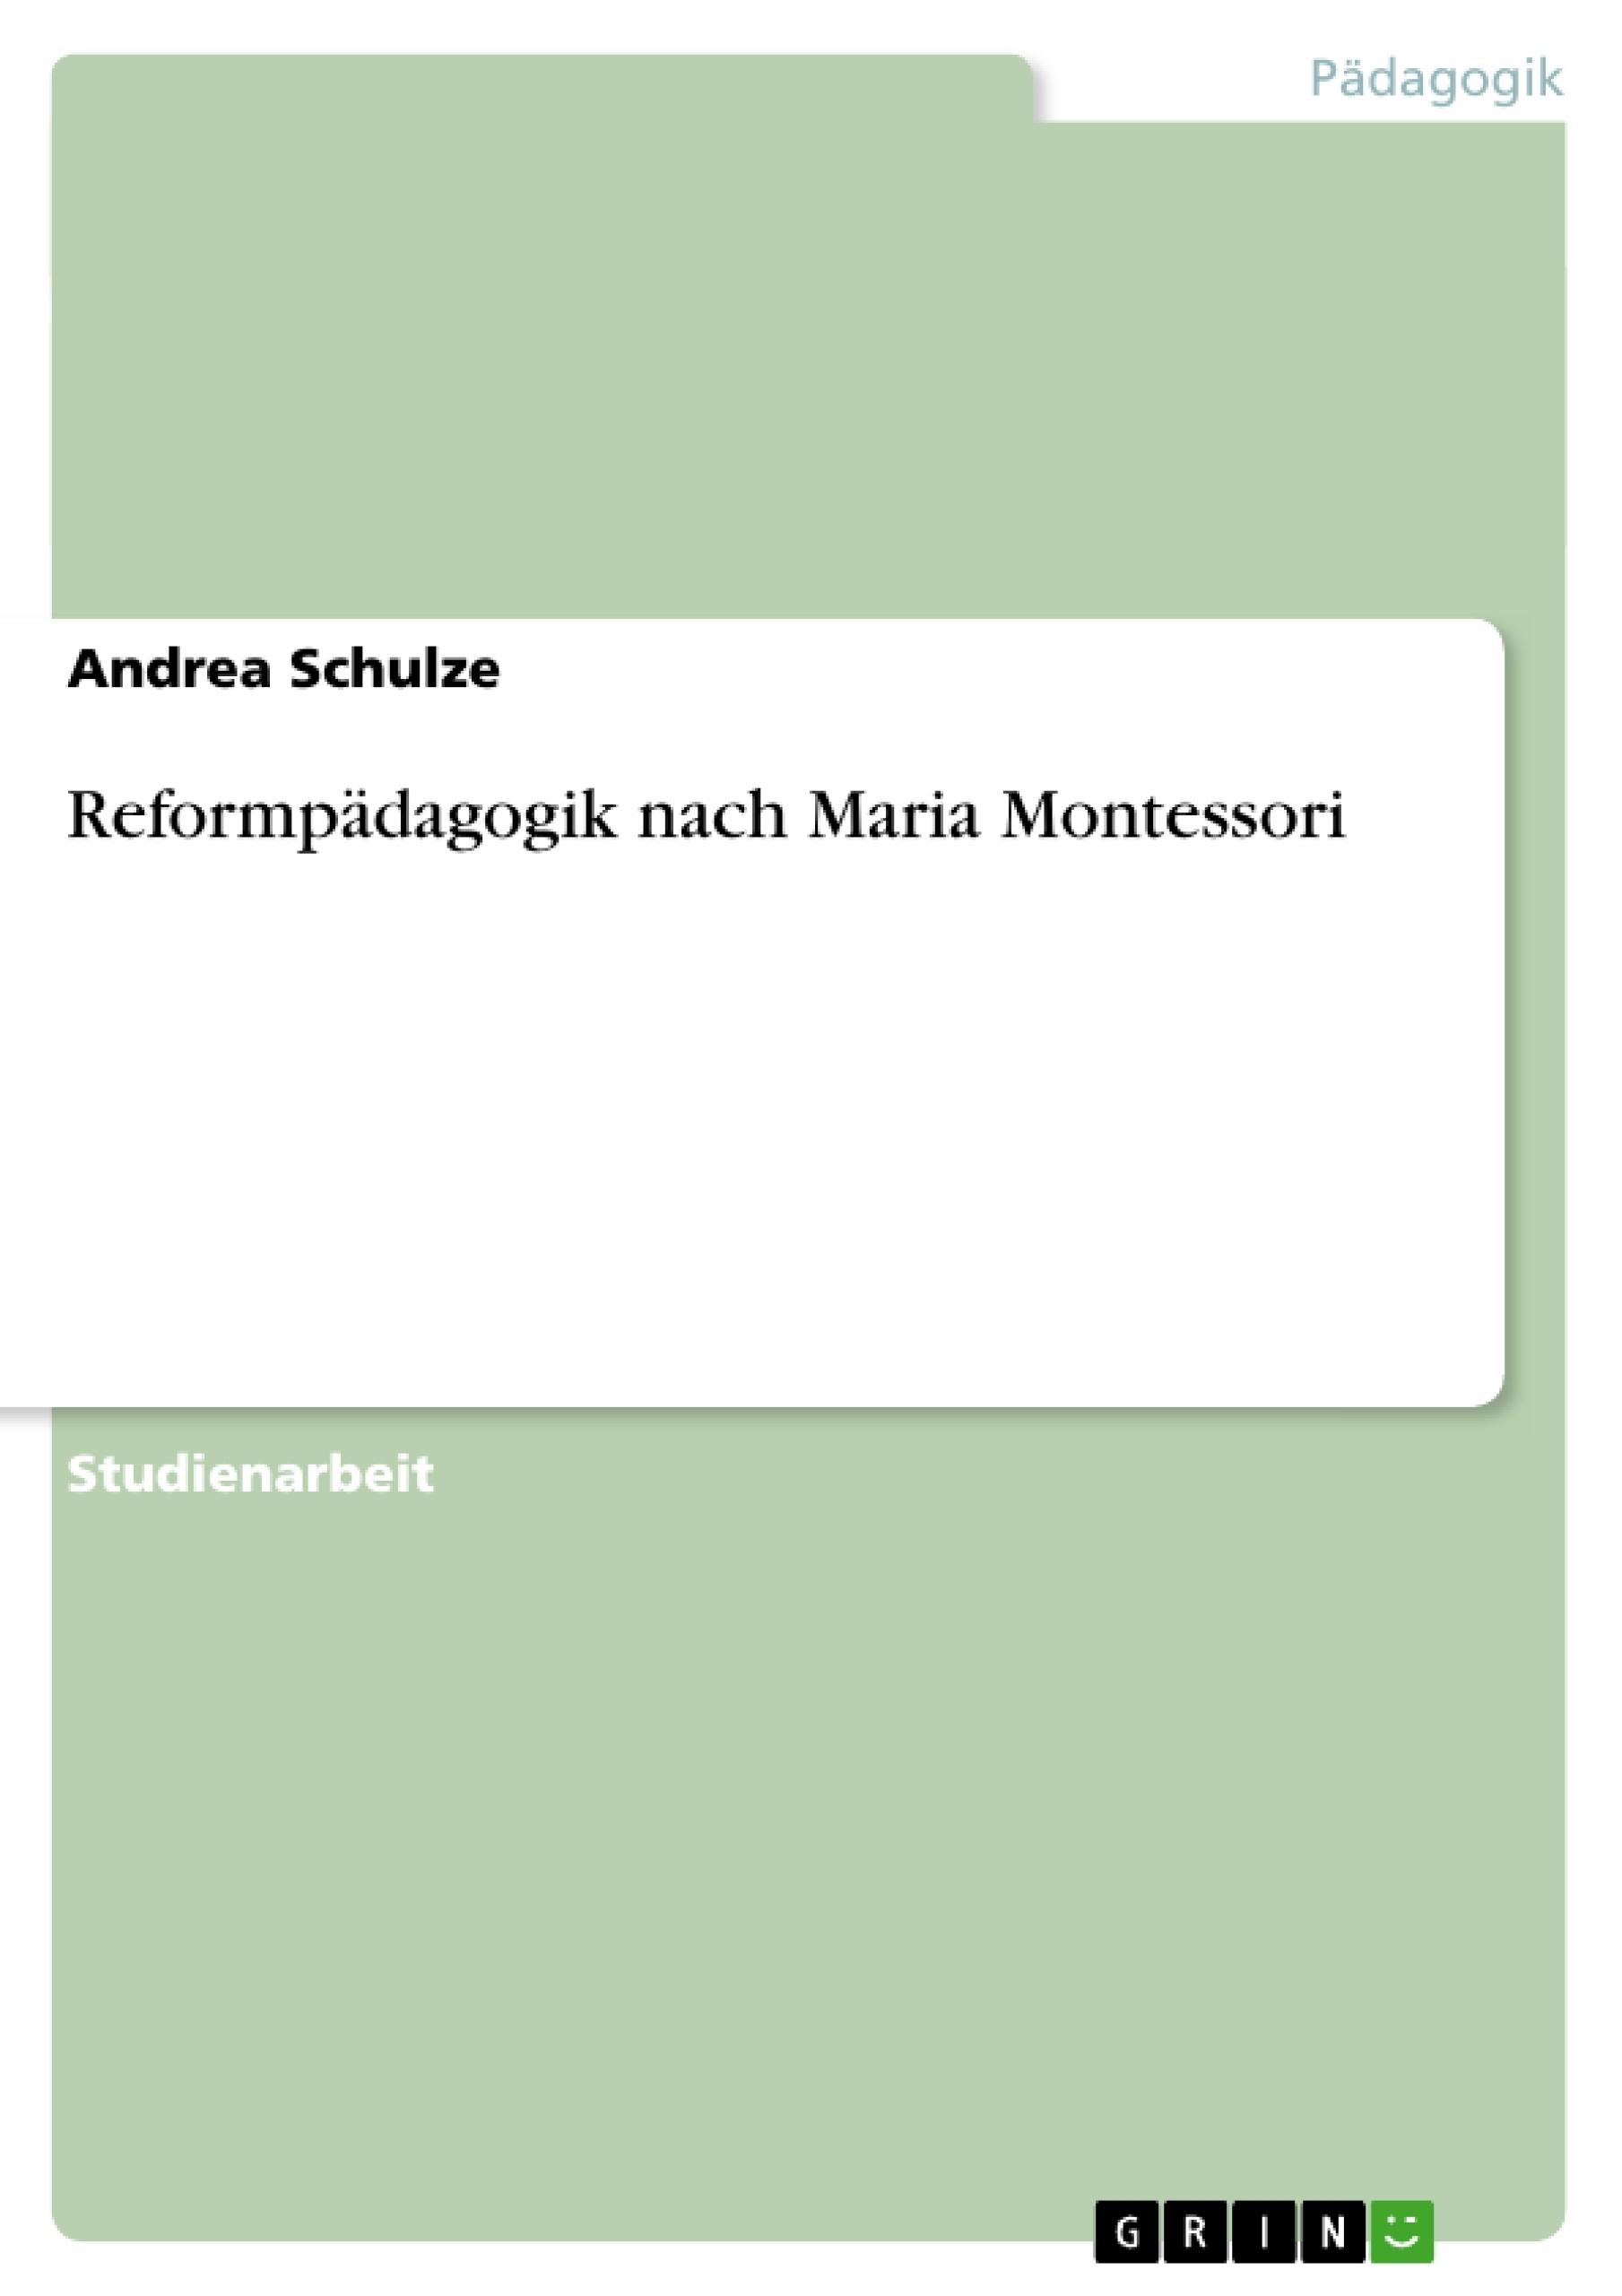 Titel: Reformpädagogik nach Maria Montessori